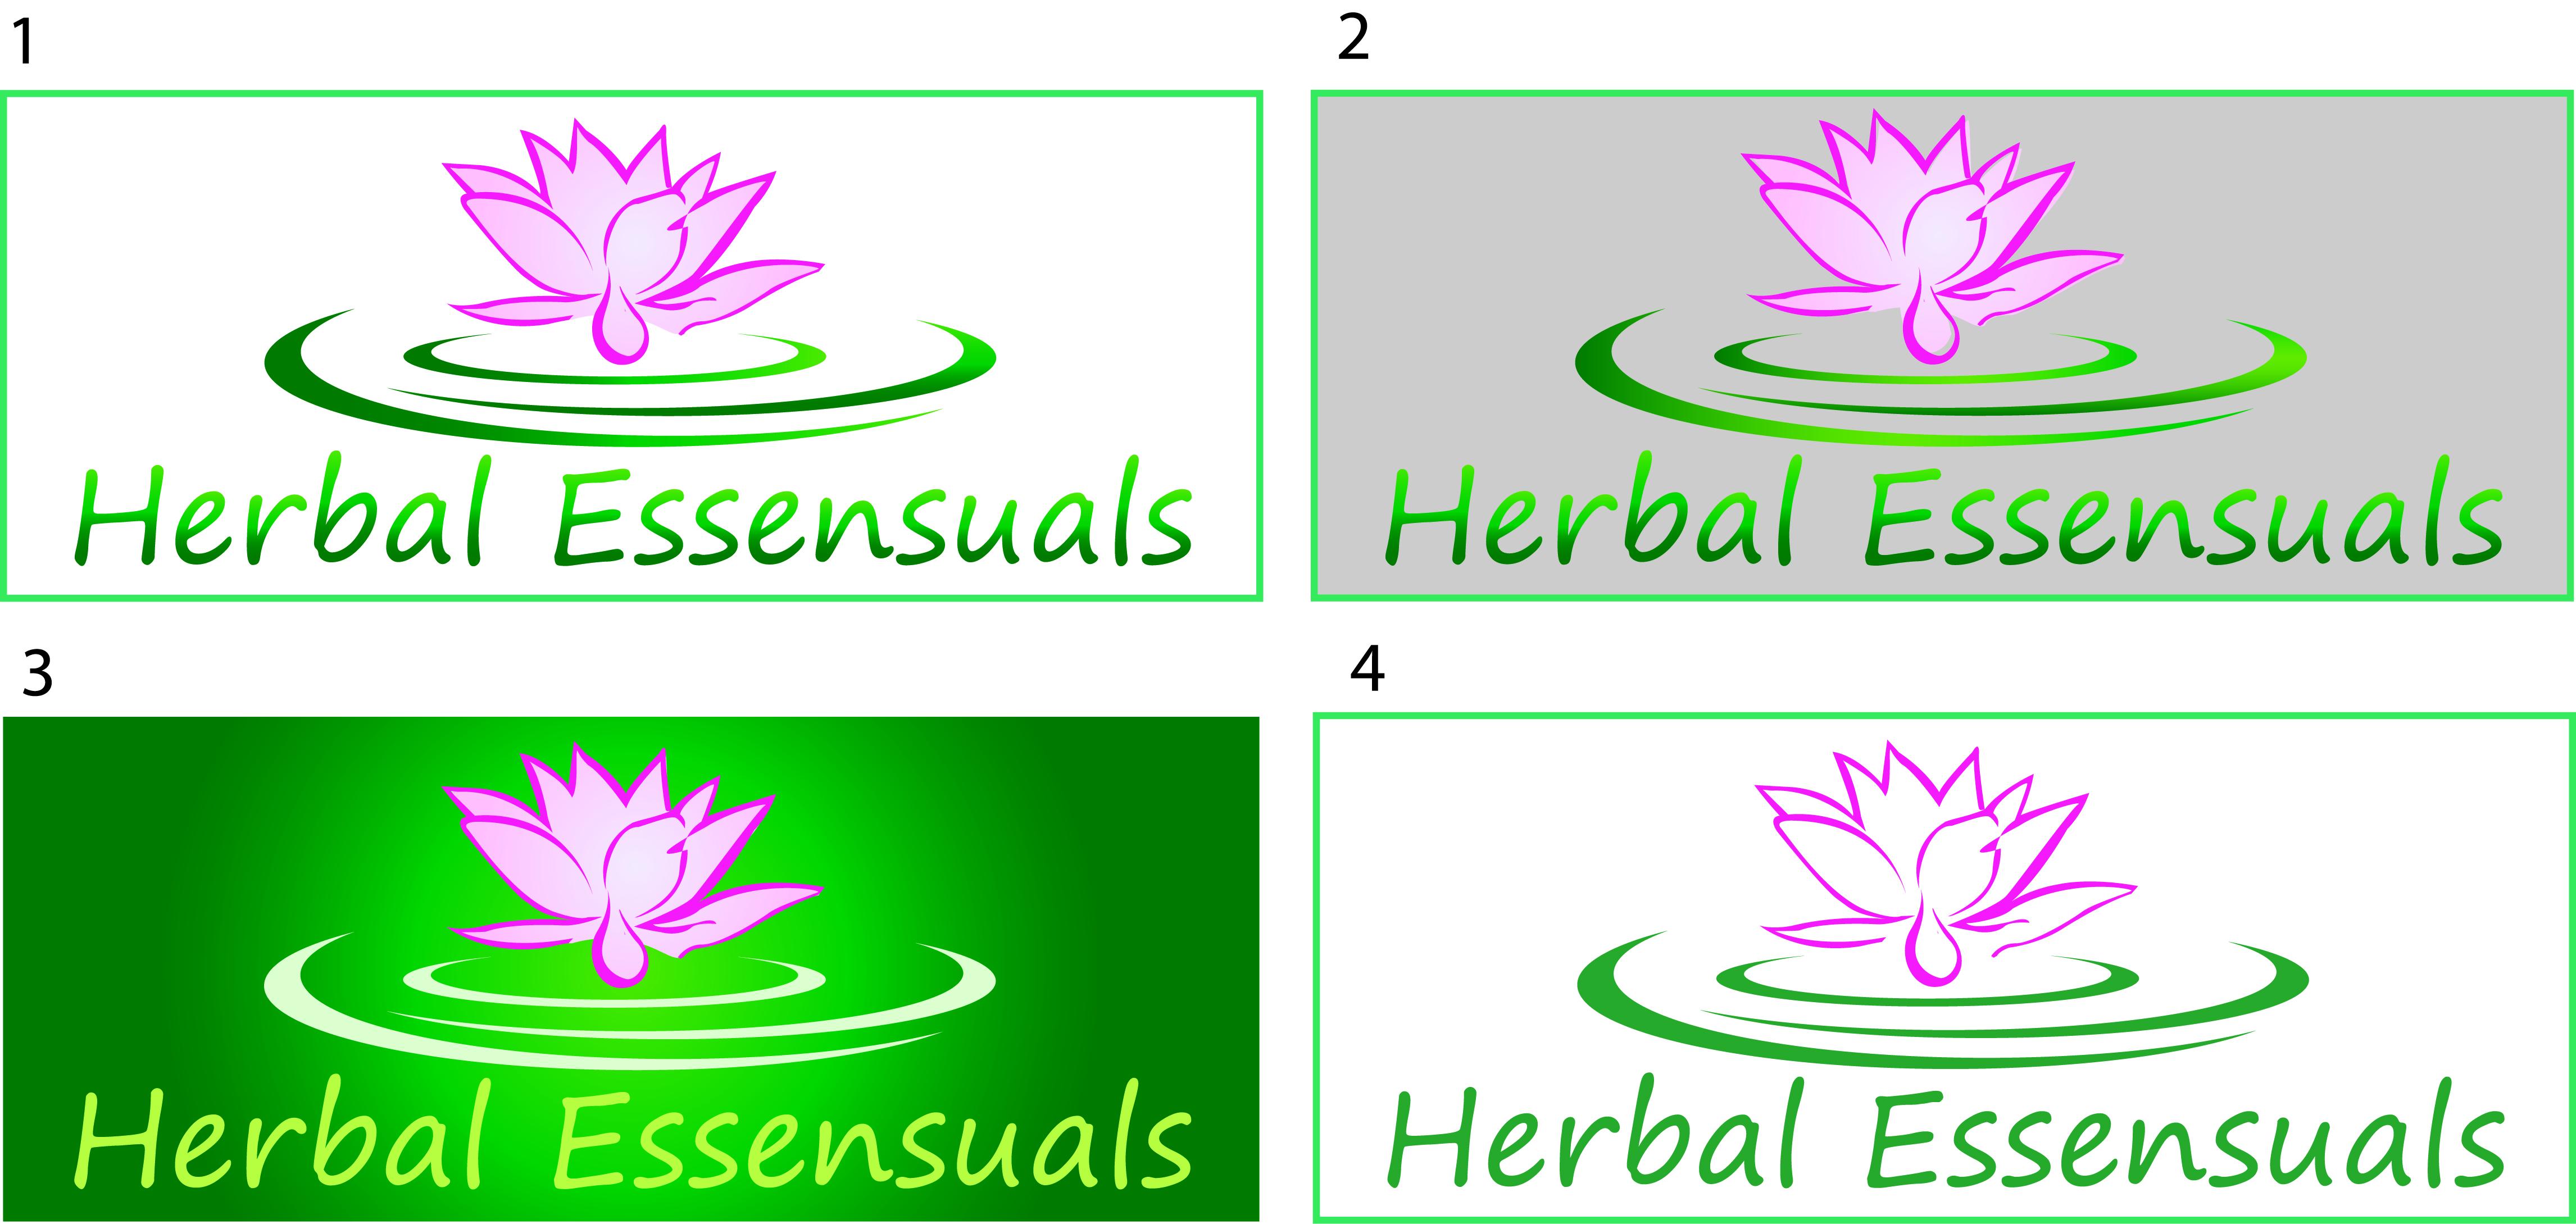 Logo Design by Laren Rabanal - Entry No. 68 in the Logo Design Contest Captivating Logo Design for Herbal Essensuals.